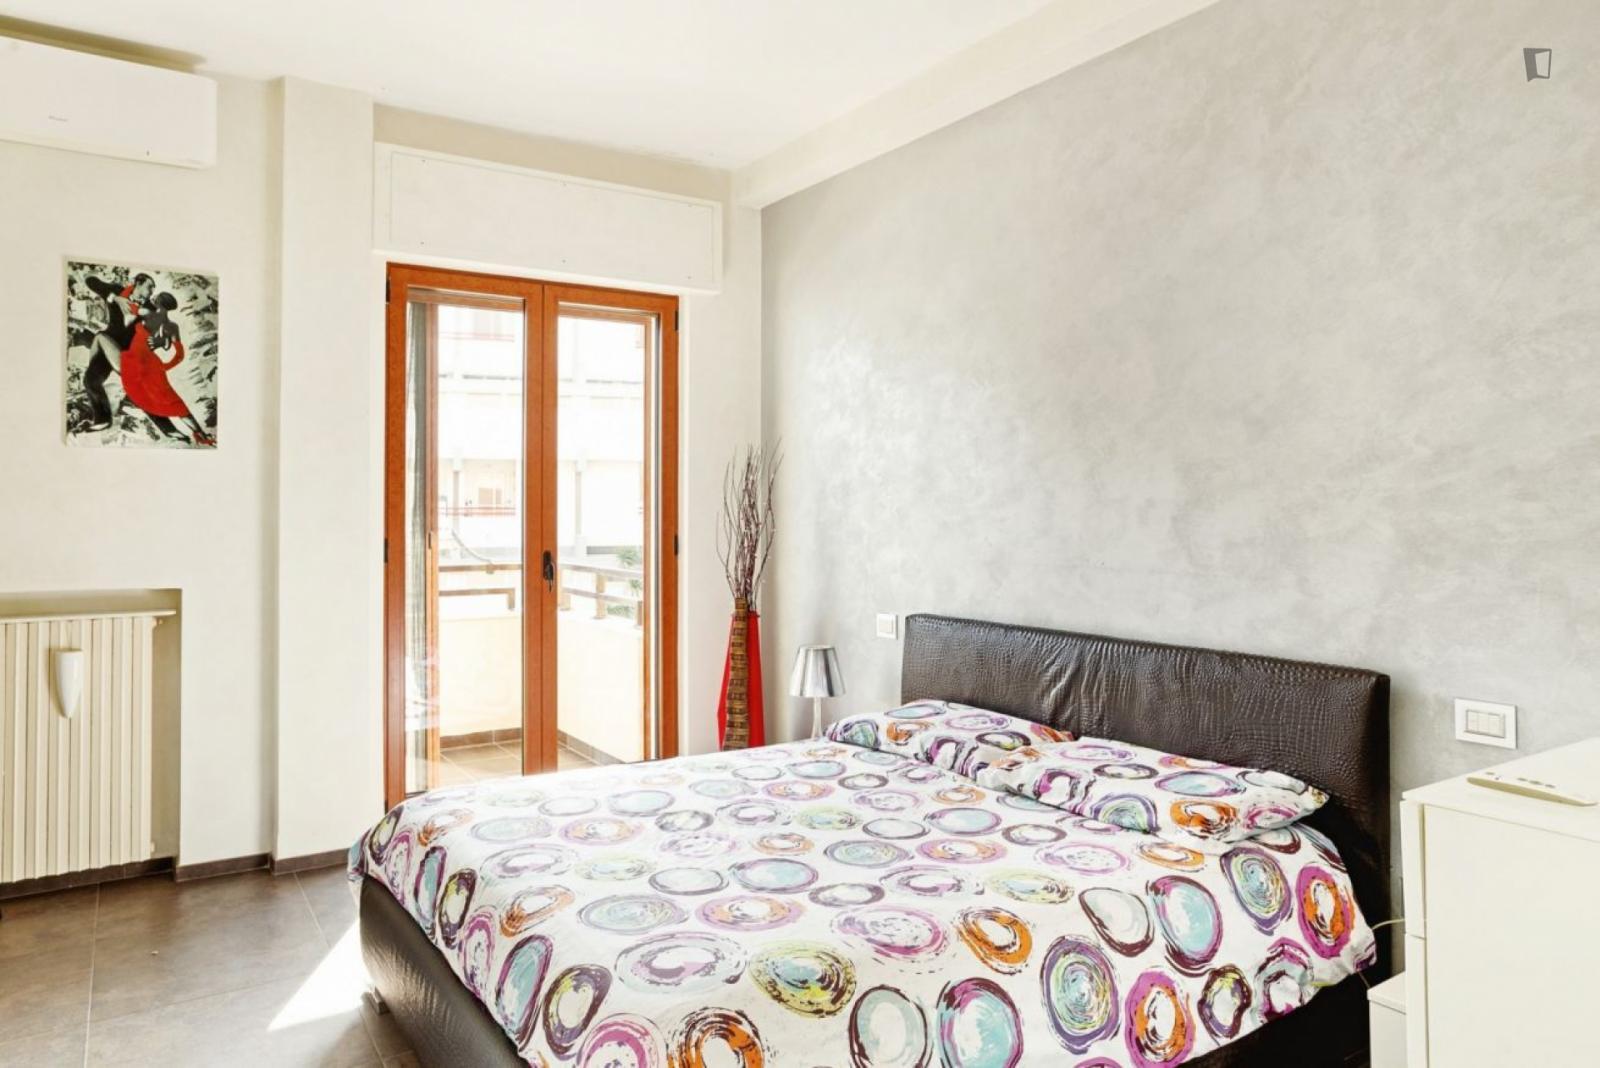 Lungomare Ugo Lorusso, Bari, IT-BA - 1,290 EUR/ month